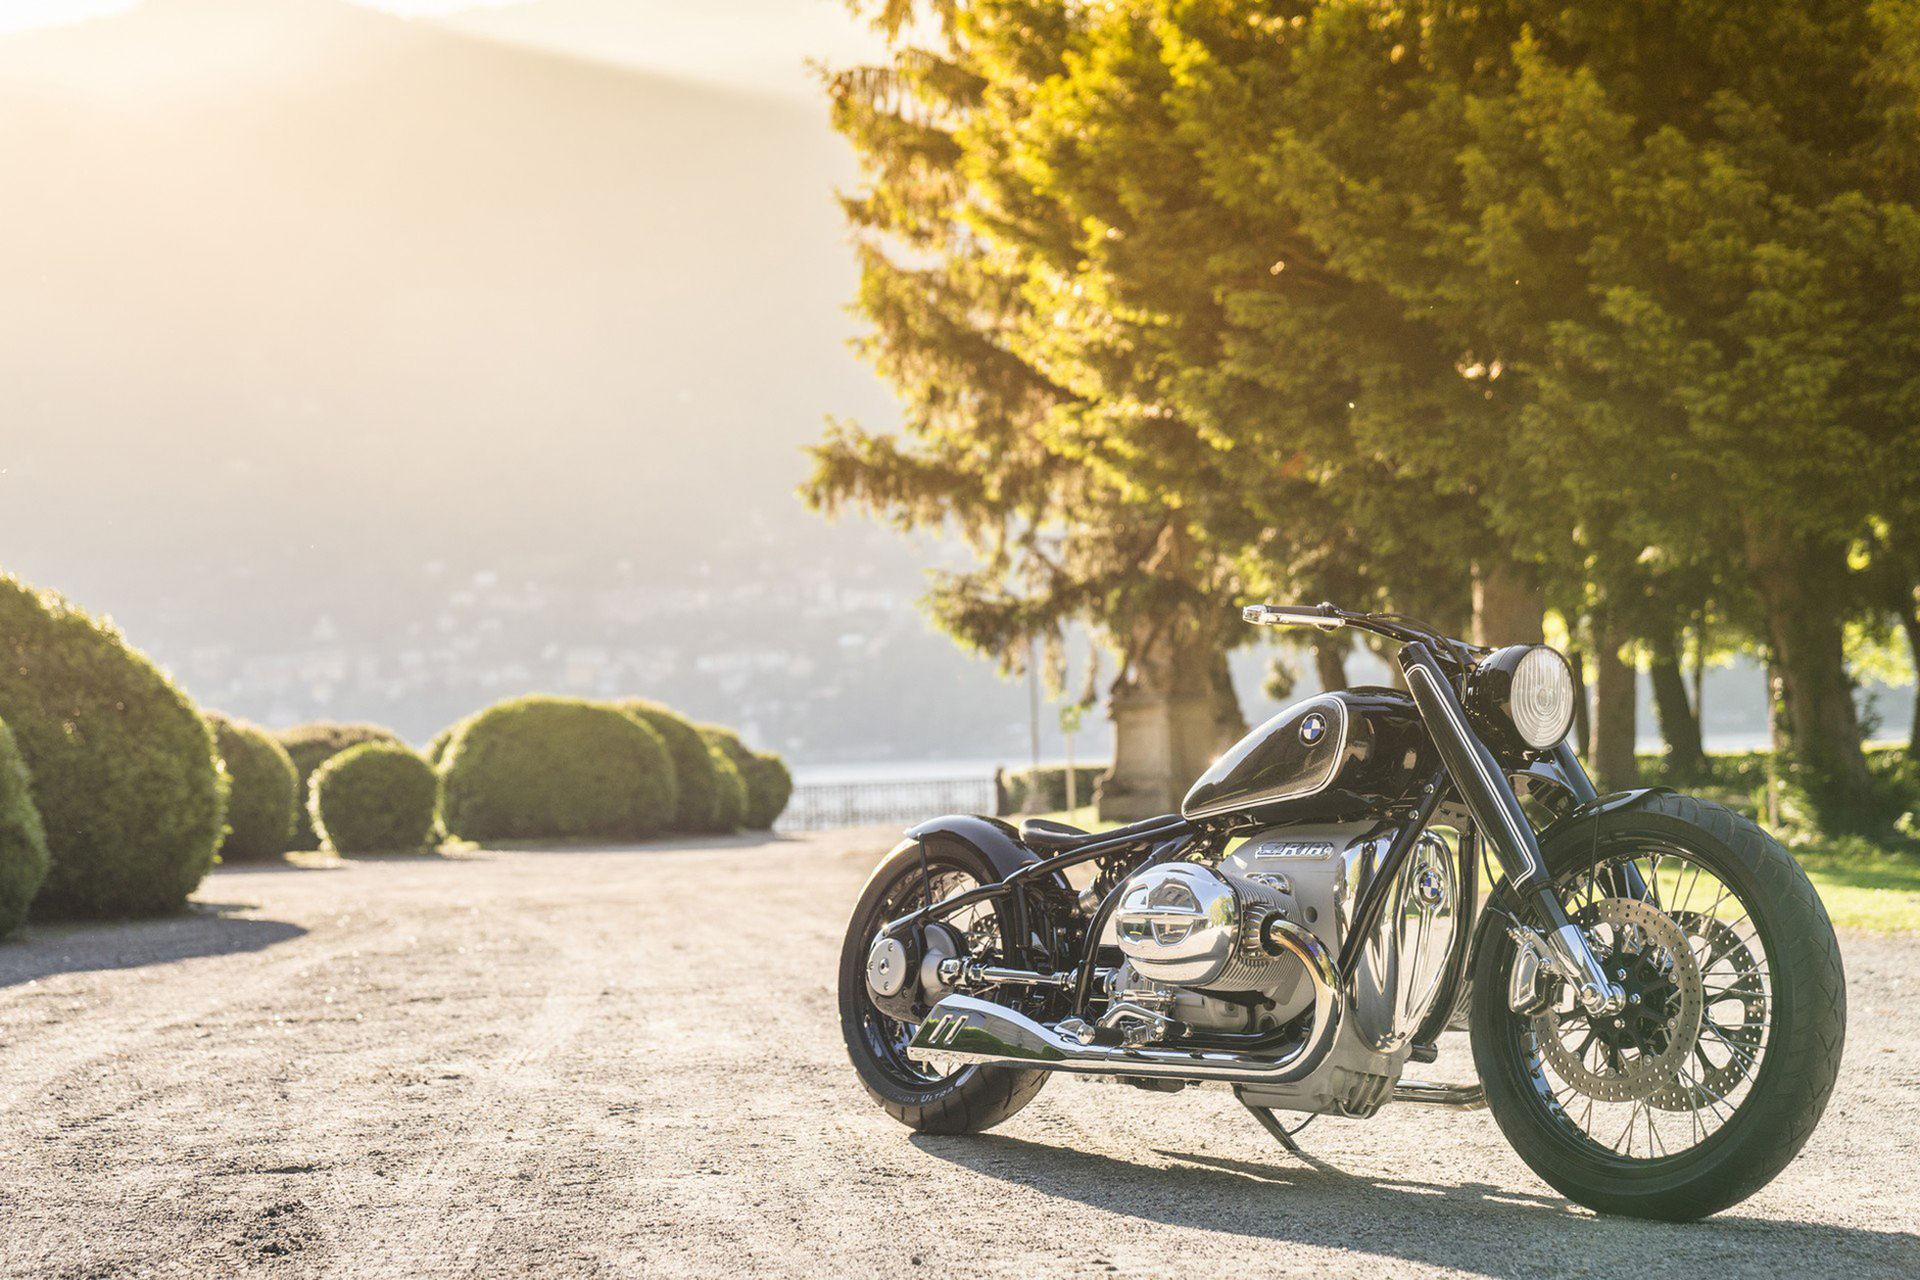 BMW visar intressant motorcykel-koncept